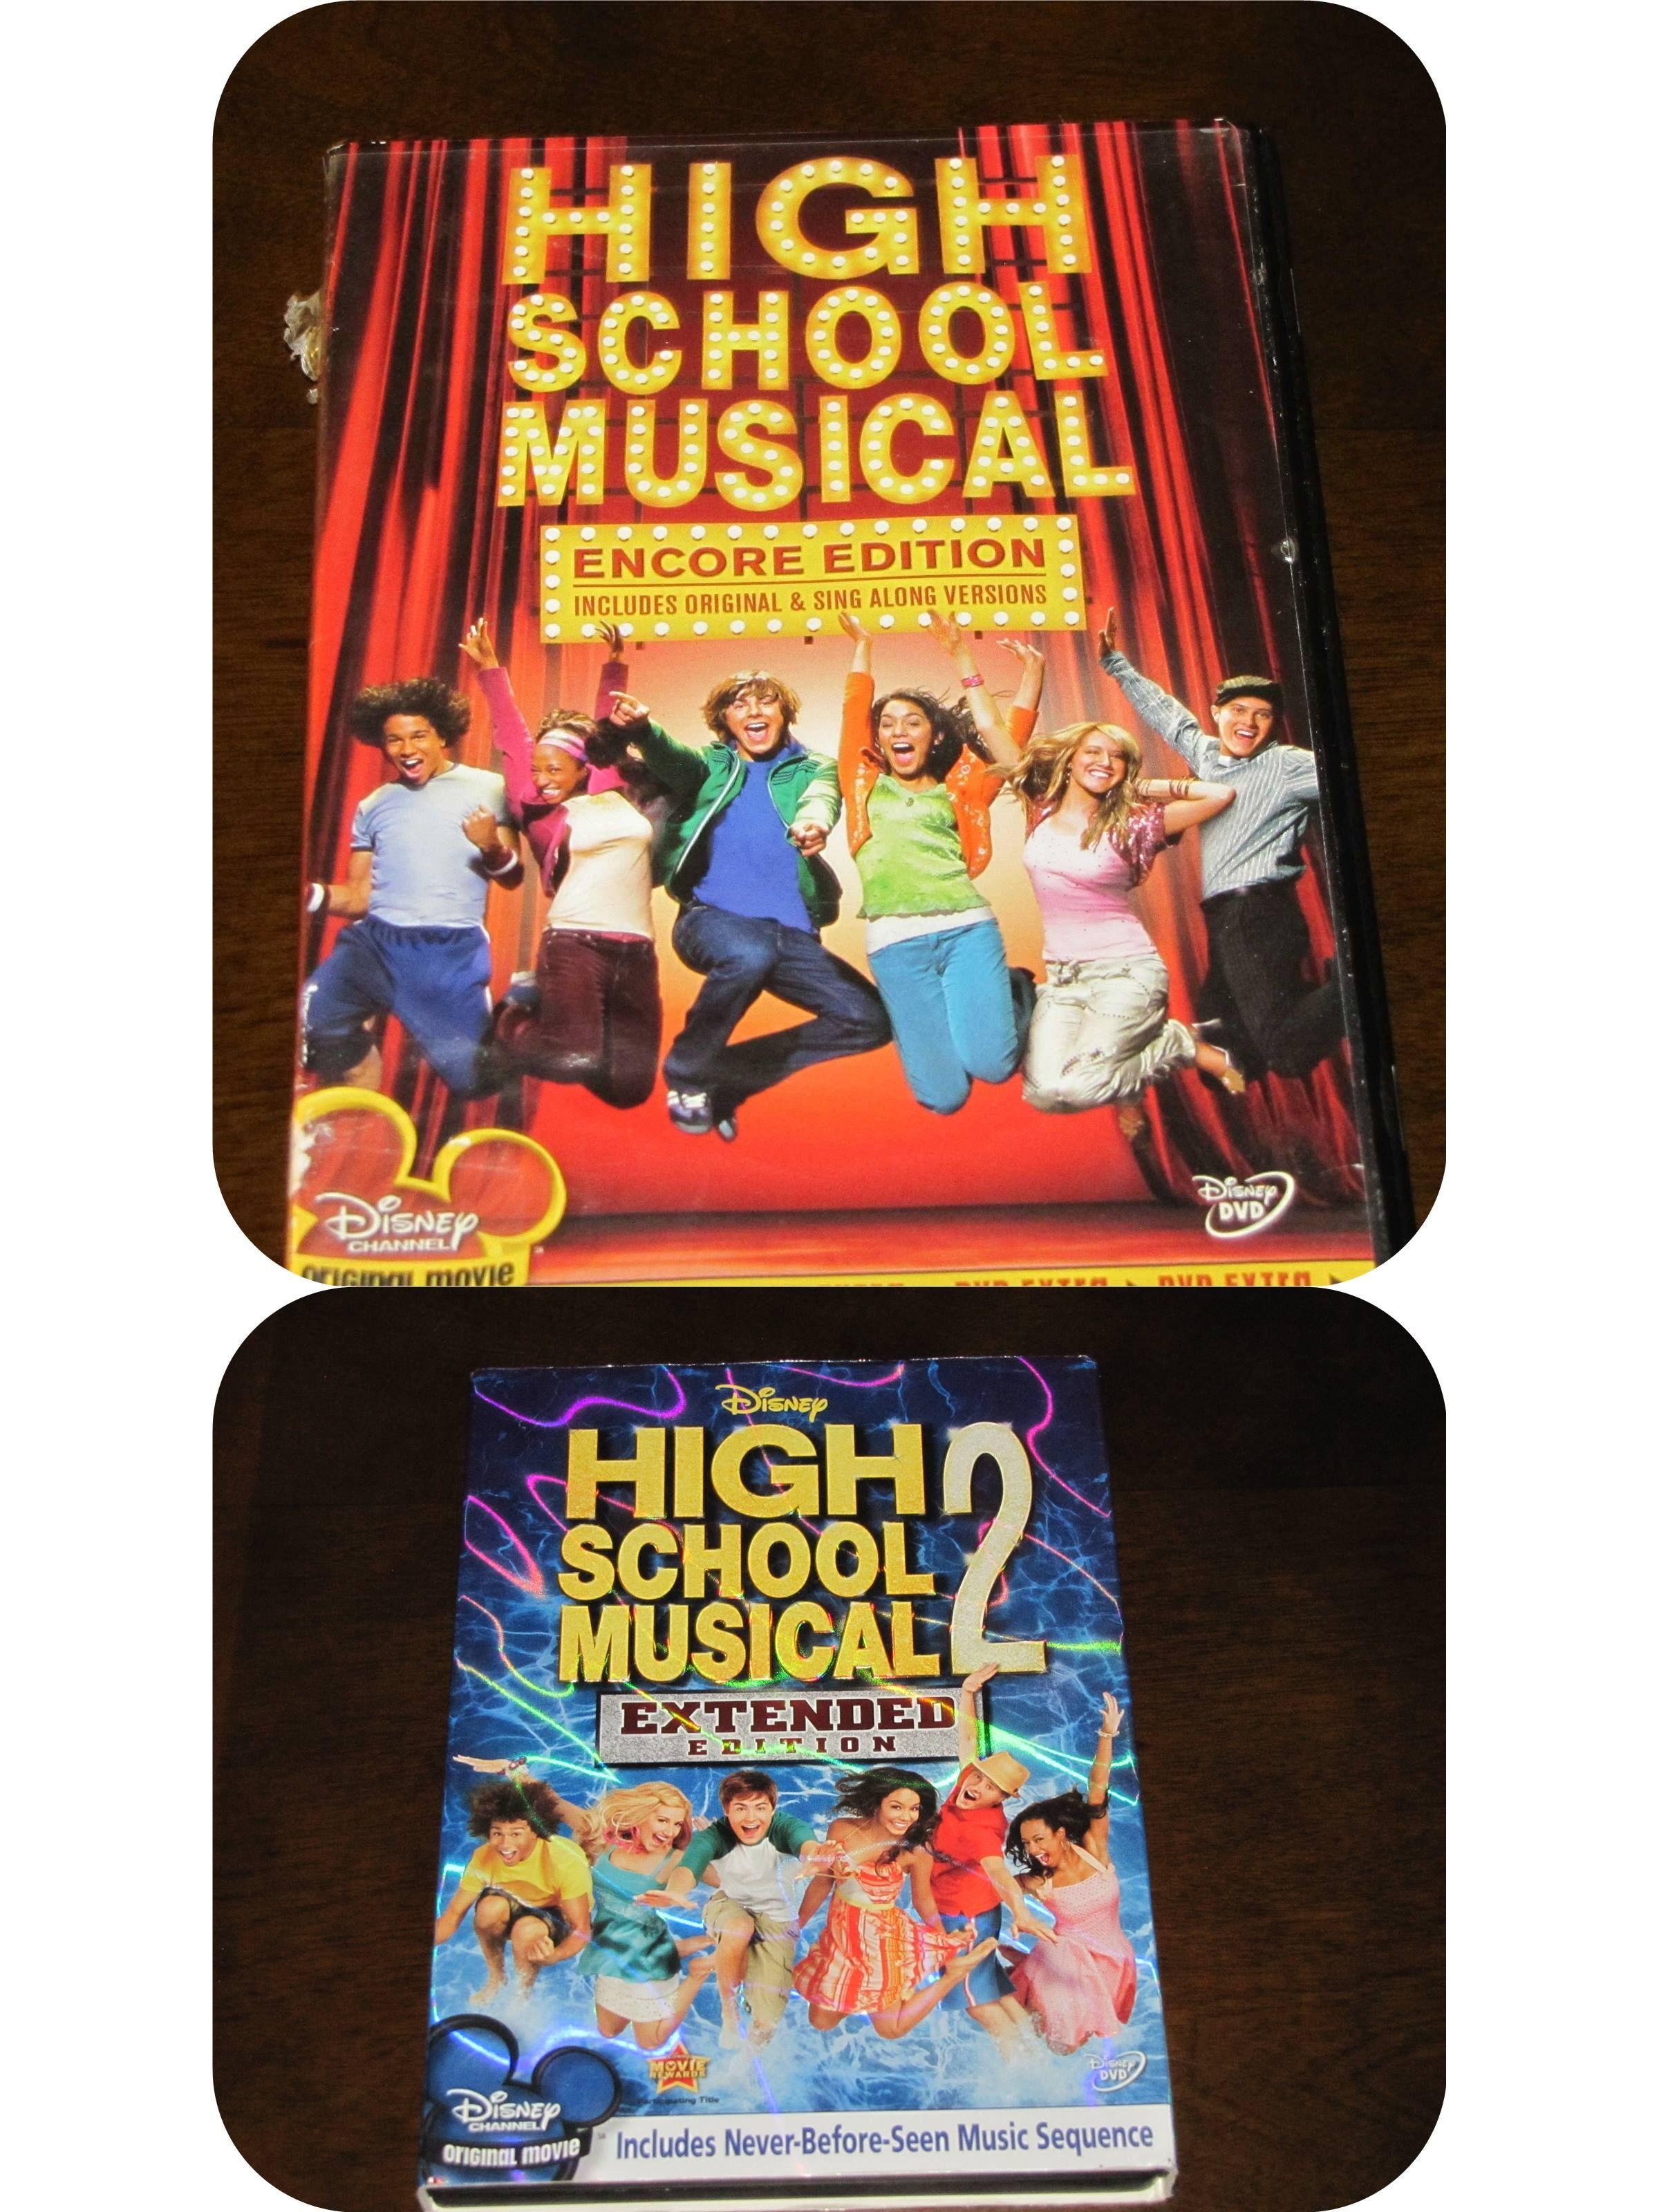 High School Musical I Ii In Jimmersonlake S Garage Sale Angola In